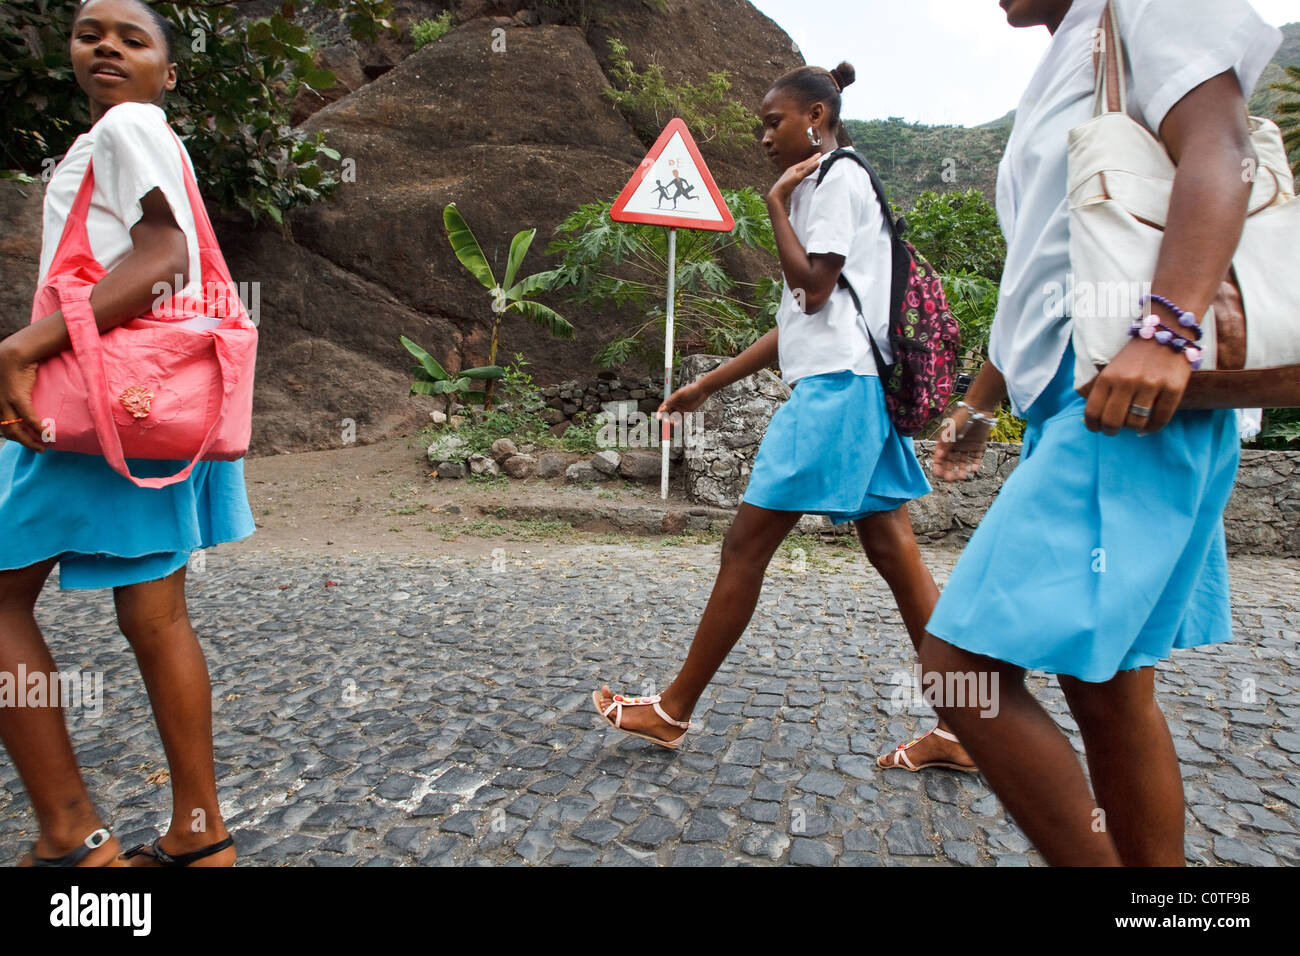 Children walk home from school near Paul, Santo Antao island, Cape Verde on Wednesday January 12, 2011. - Stock Image